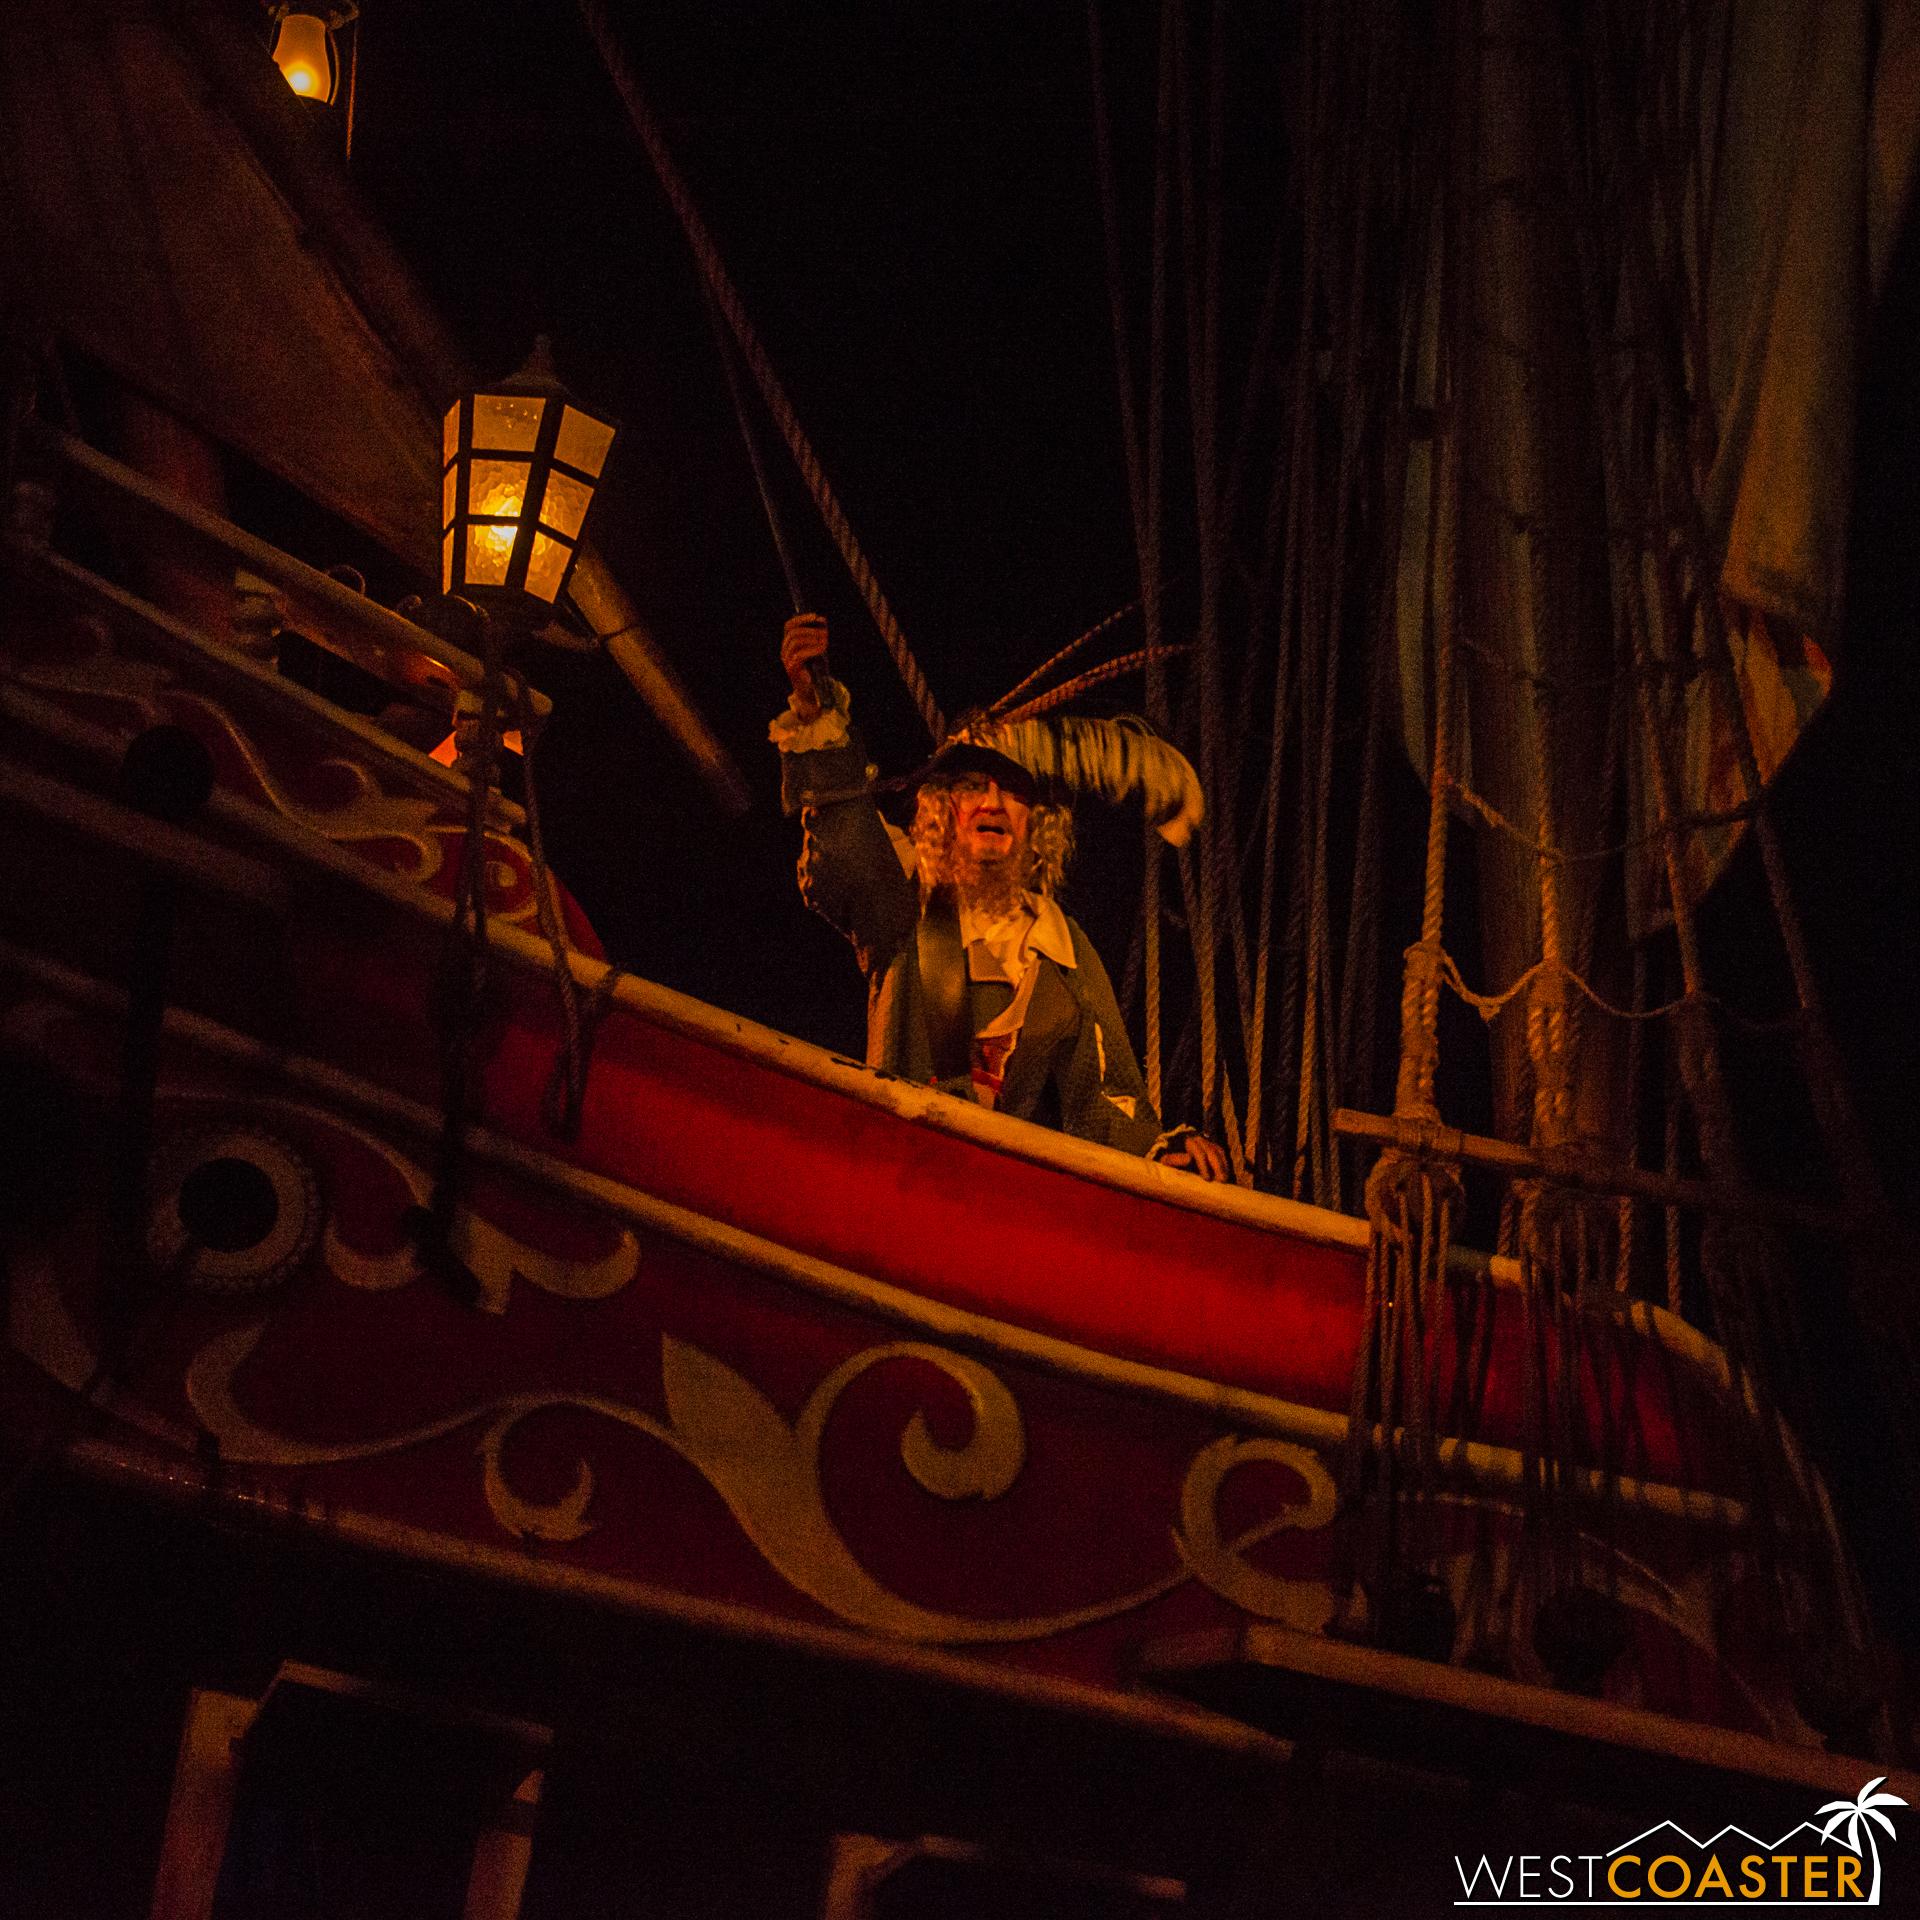 Captain Barbossa demands the location of Jack Sparrow.